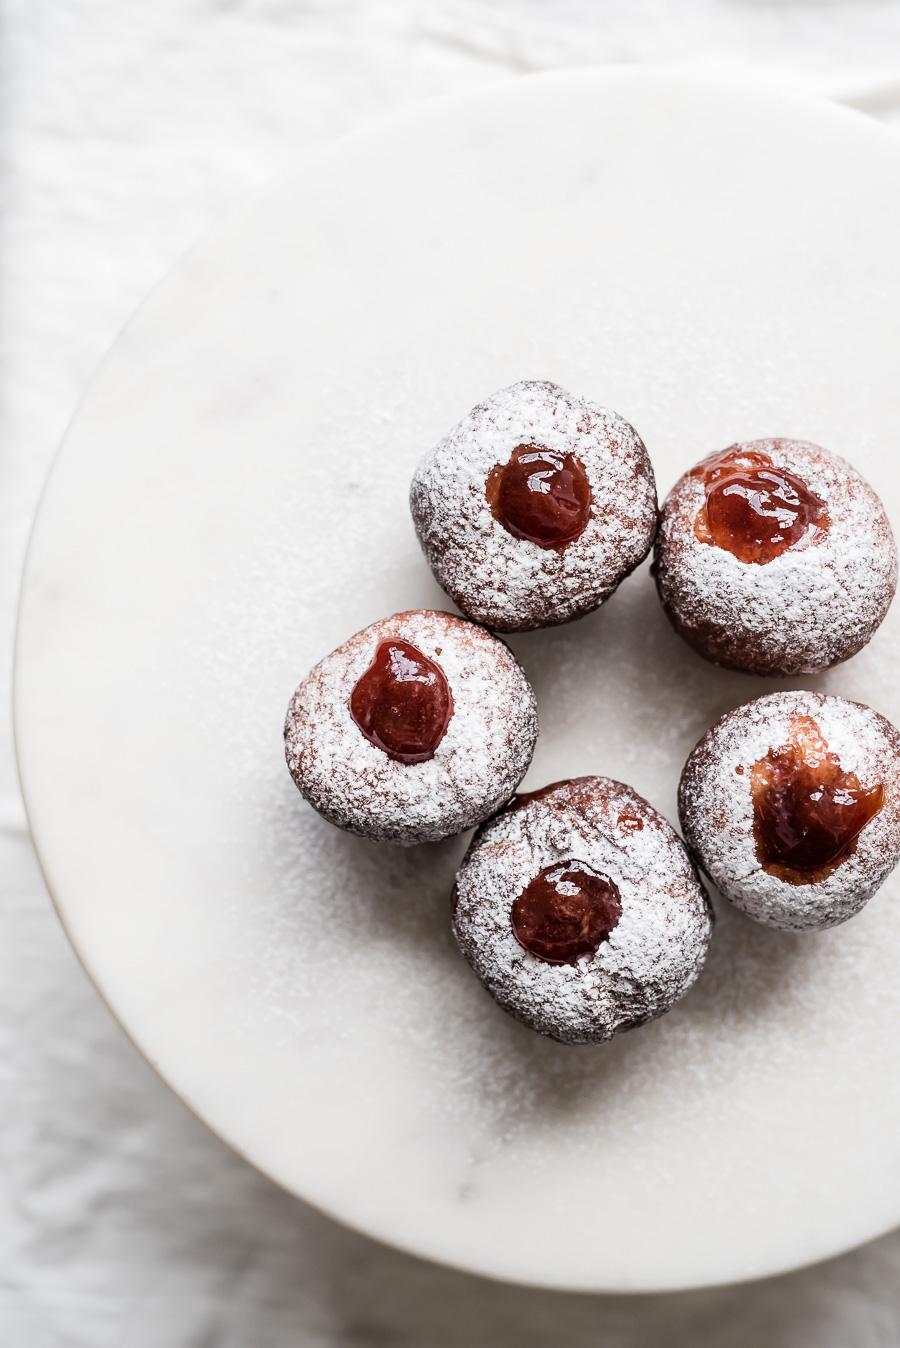 Sufganiyot: Israeli Doughnuts with Jam or Miso Caramel | Gather a Table